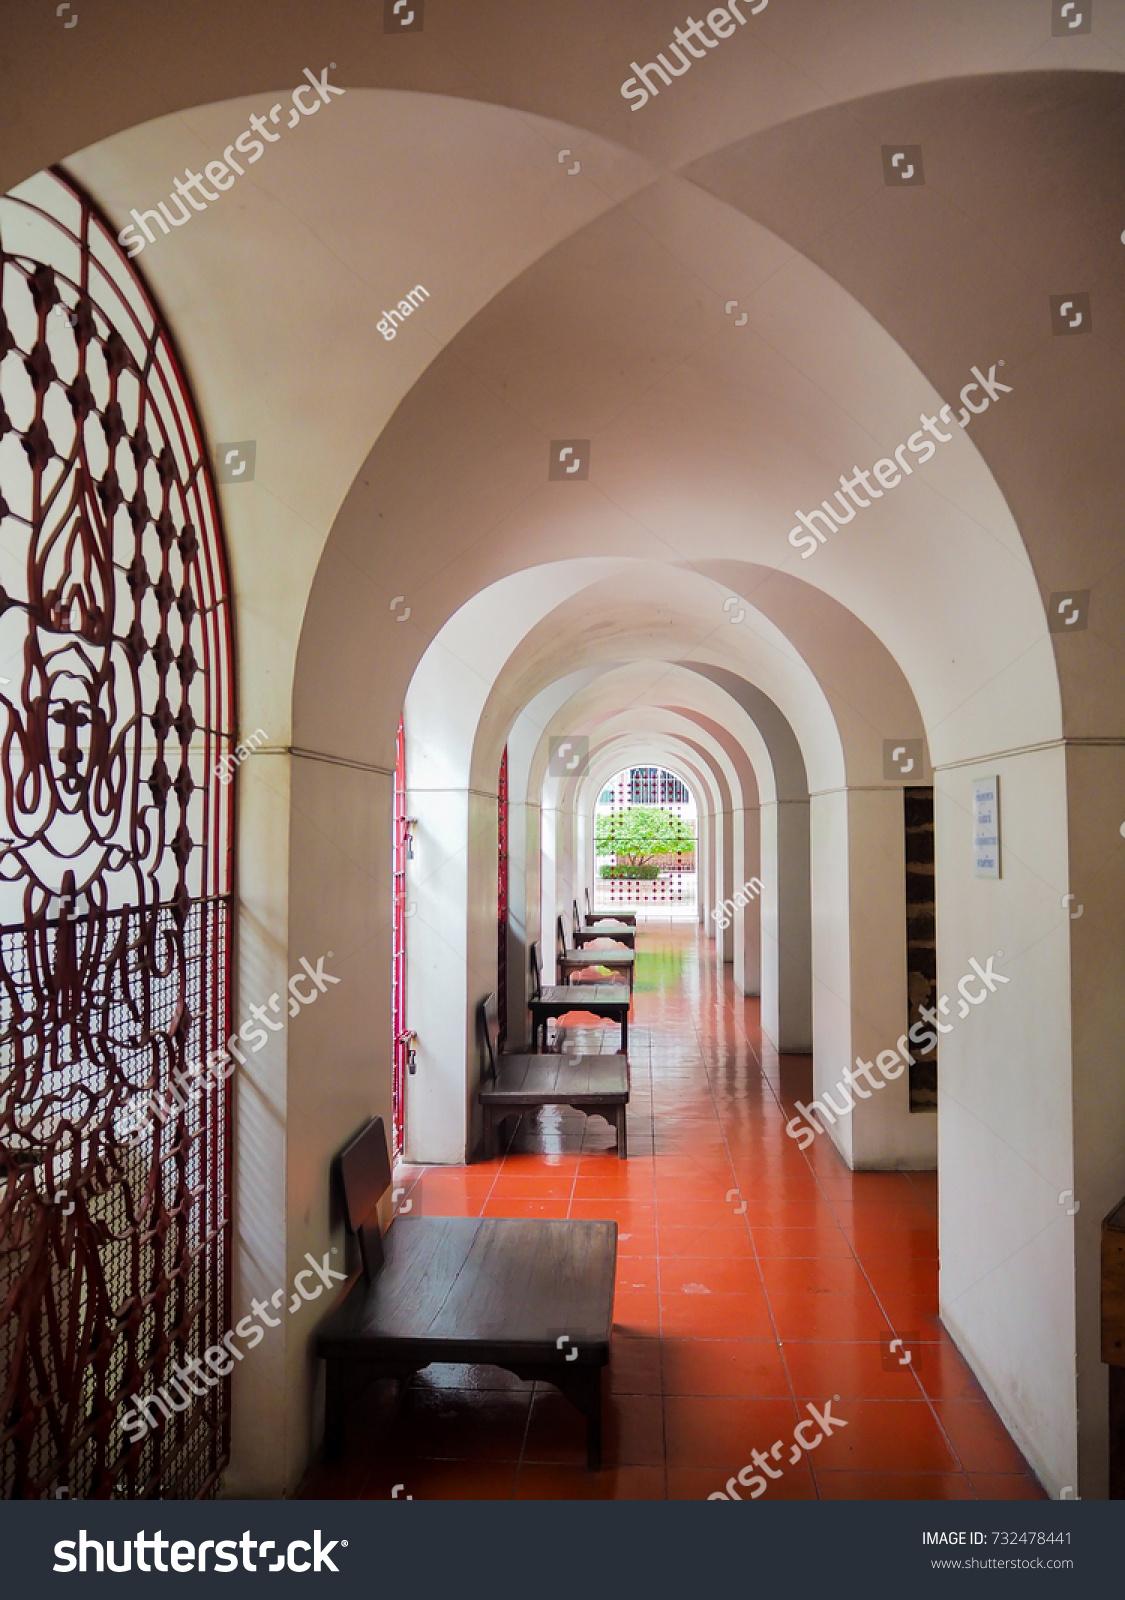 Corridor architecture temple archceilingceiling archshadowrhythm